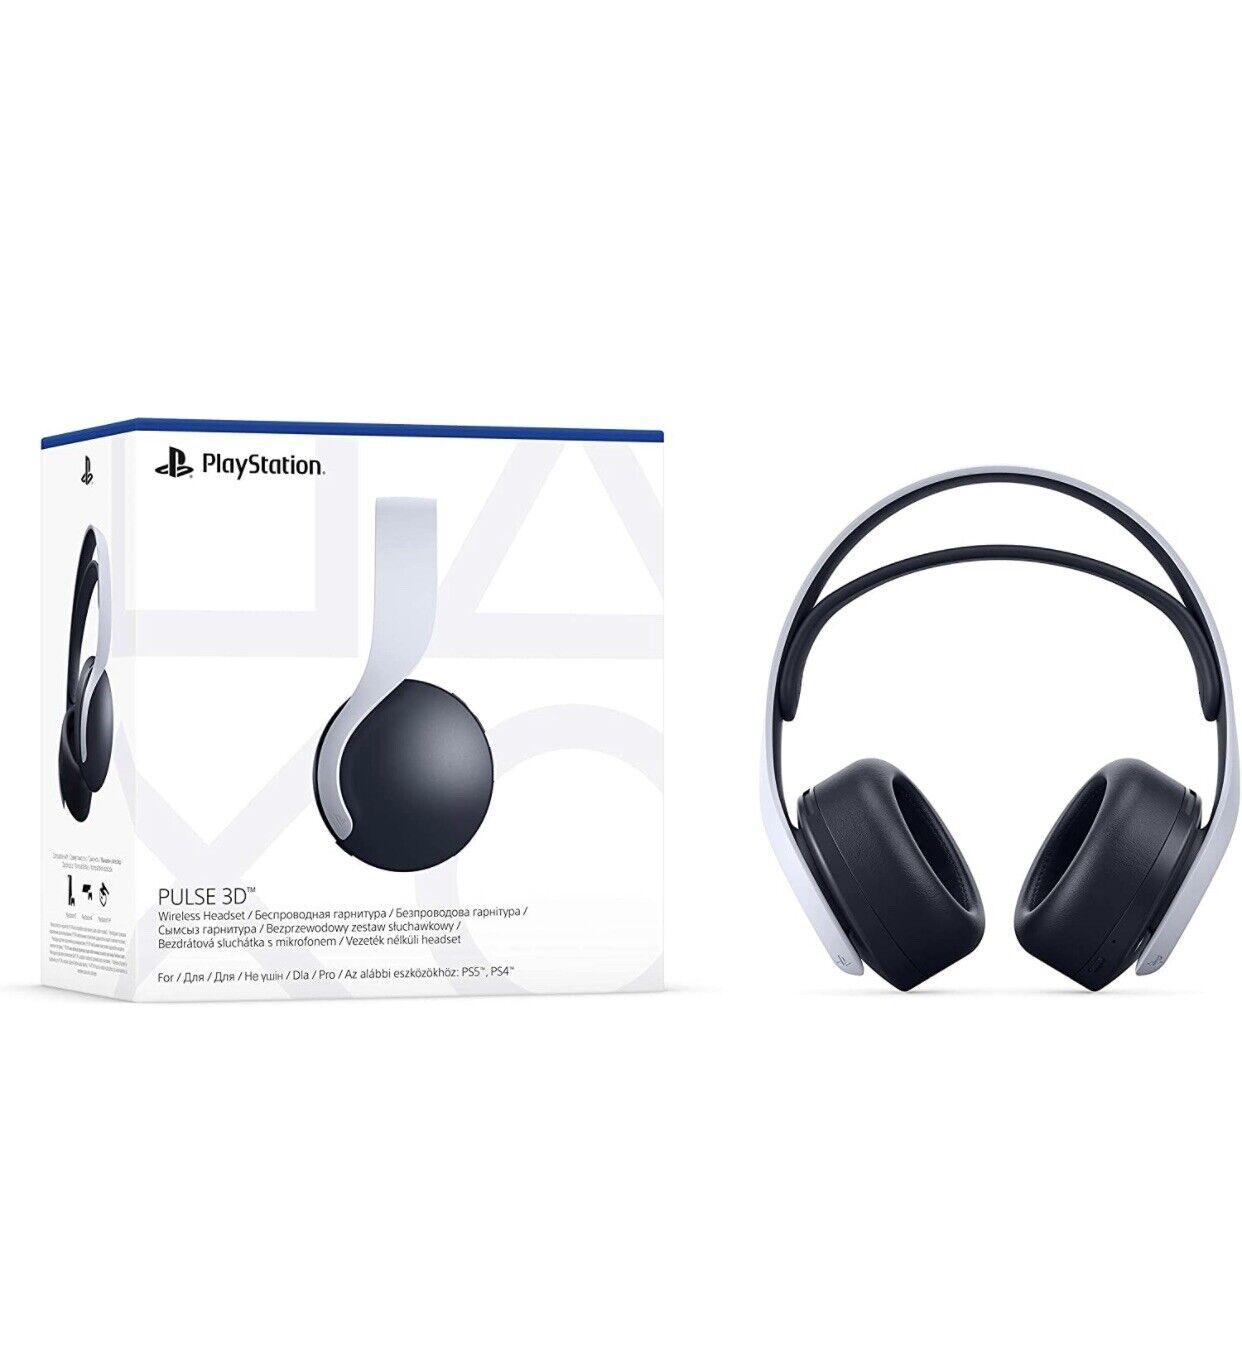 Sony PS5 Headset PLAYSTATION 5 Pulse 3D Wireless Headset Original Sony New